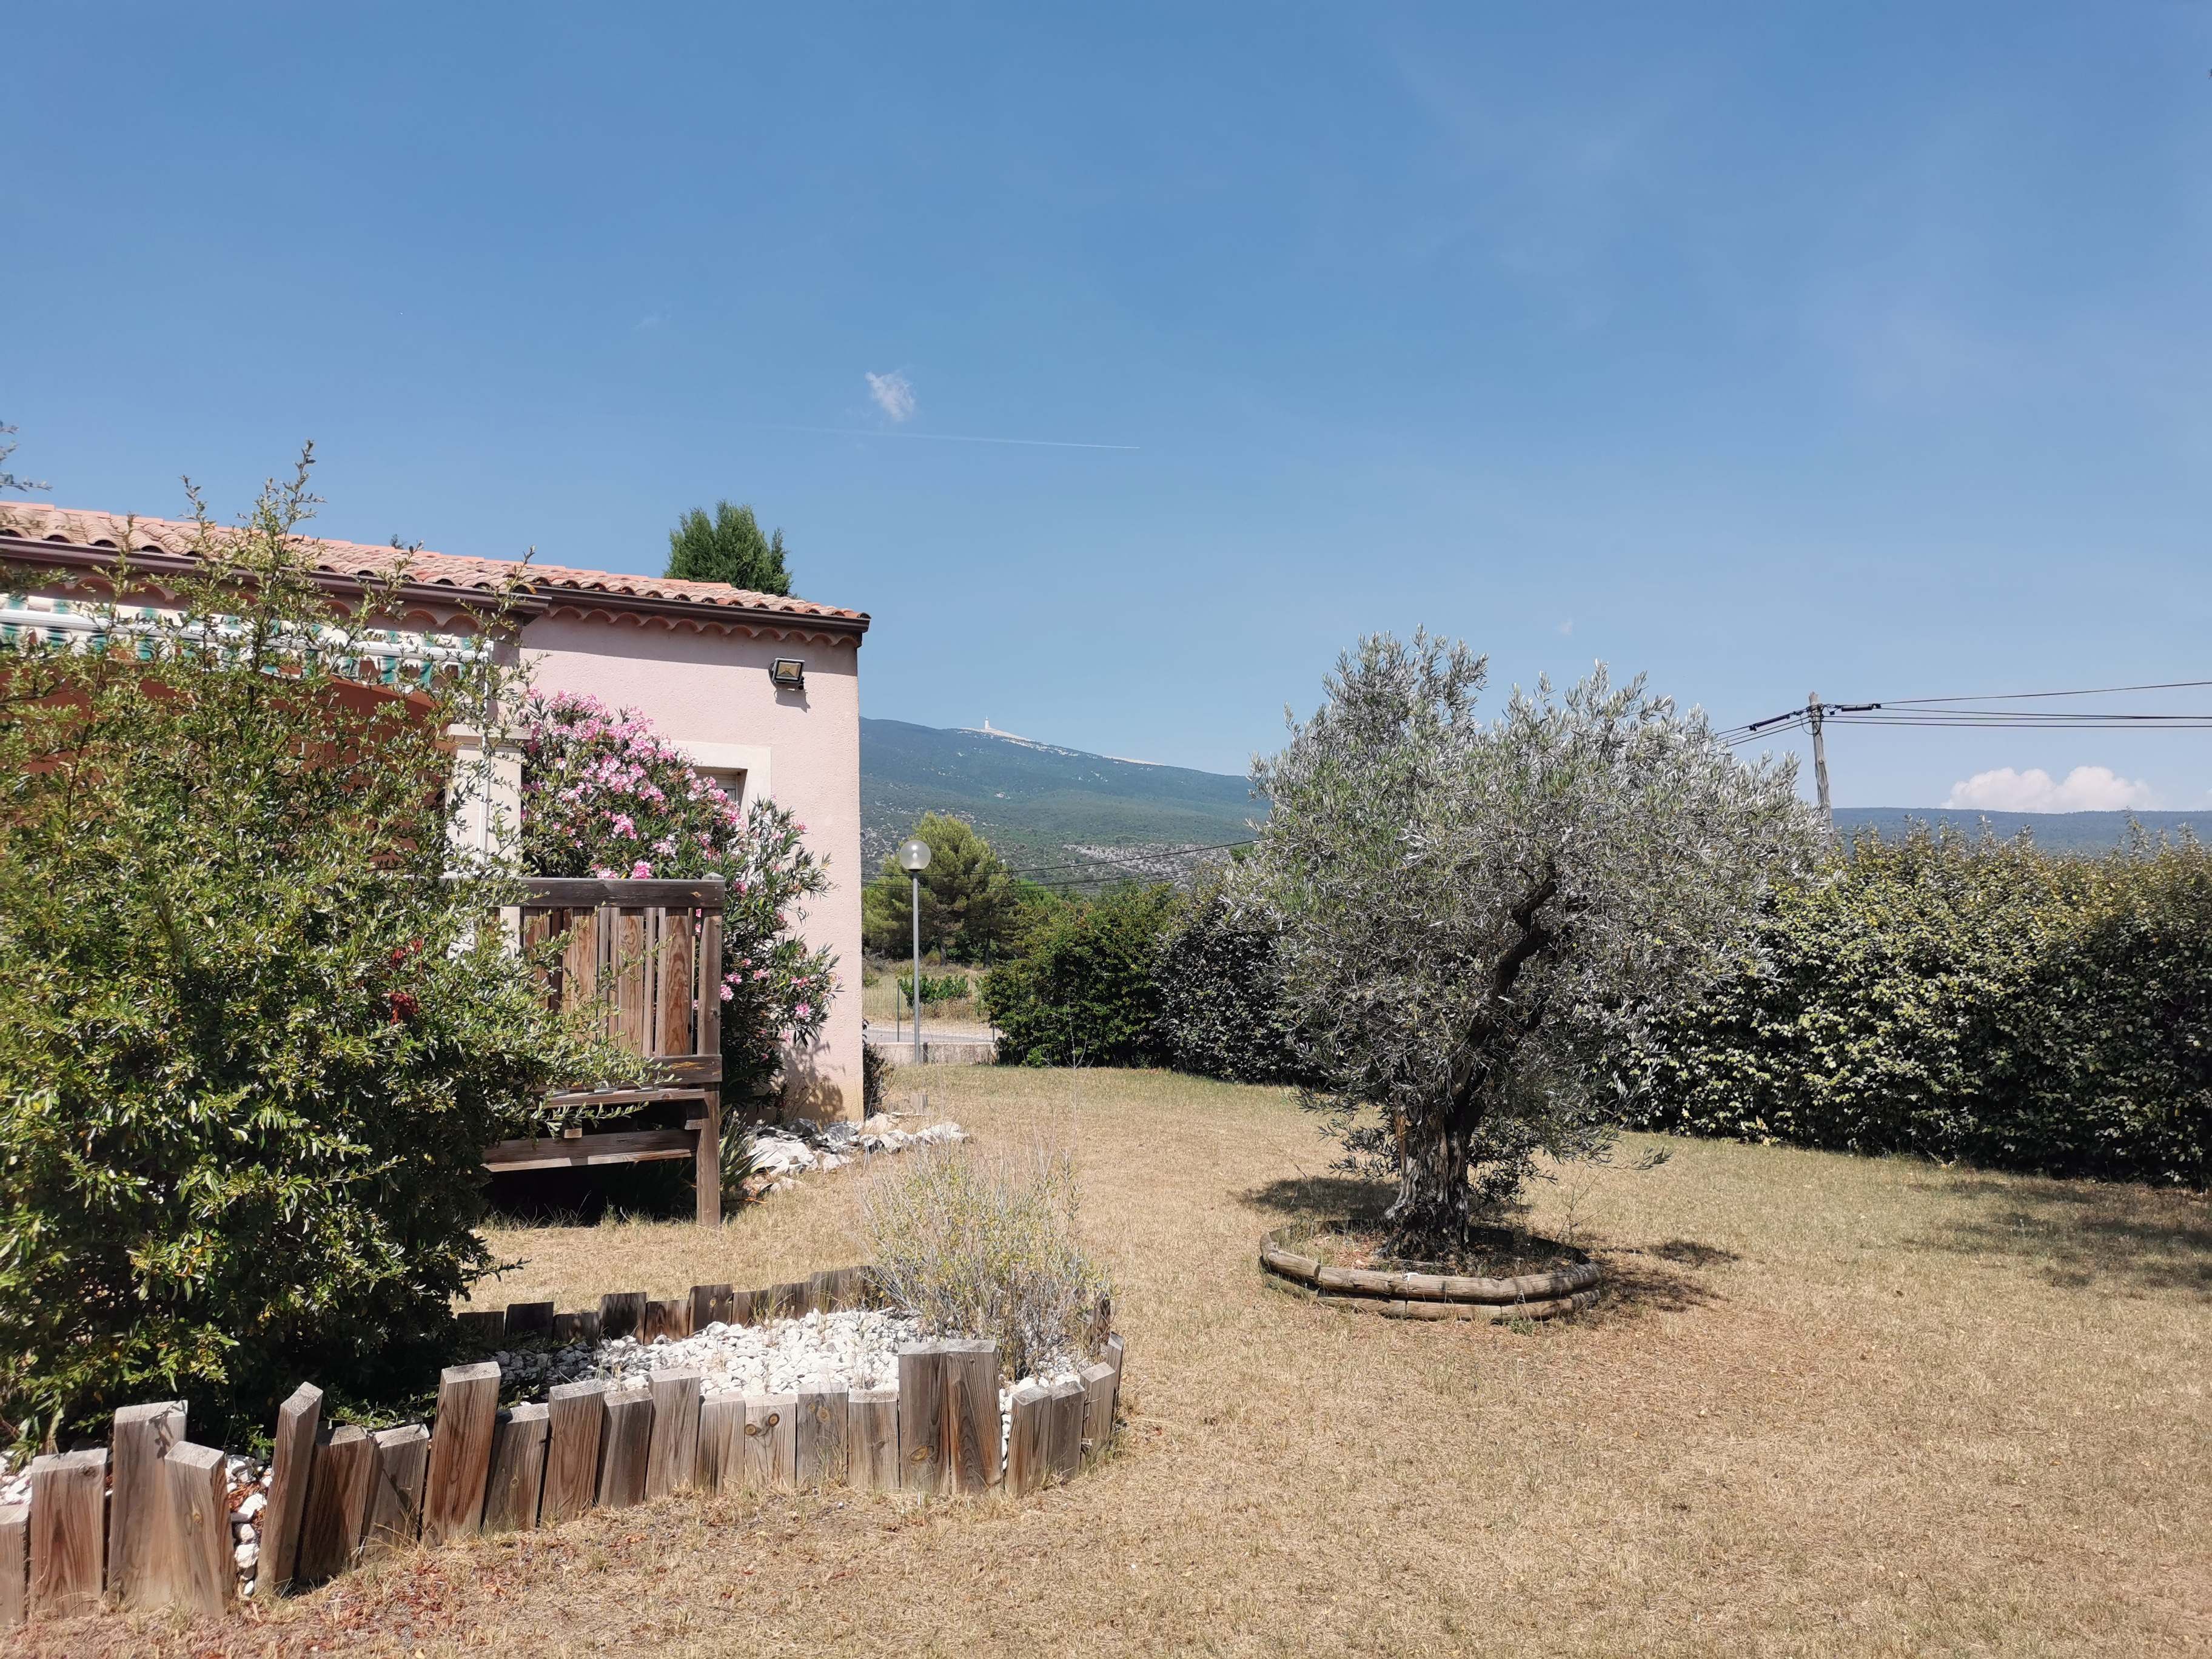 Bedoin : maison avec jardin et garage